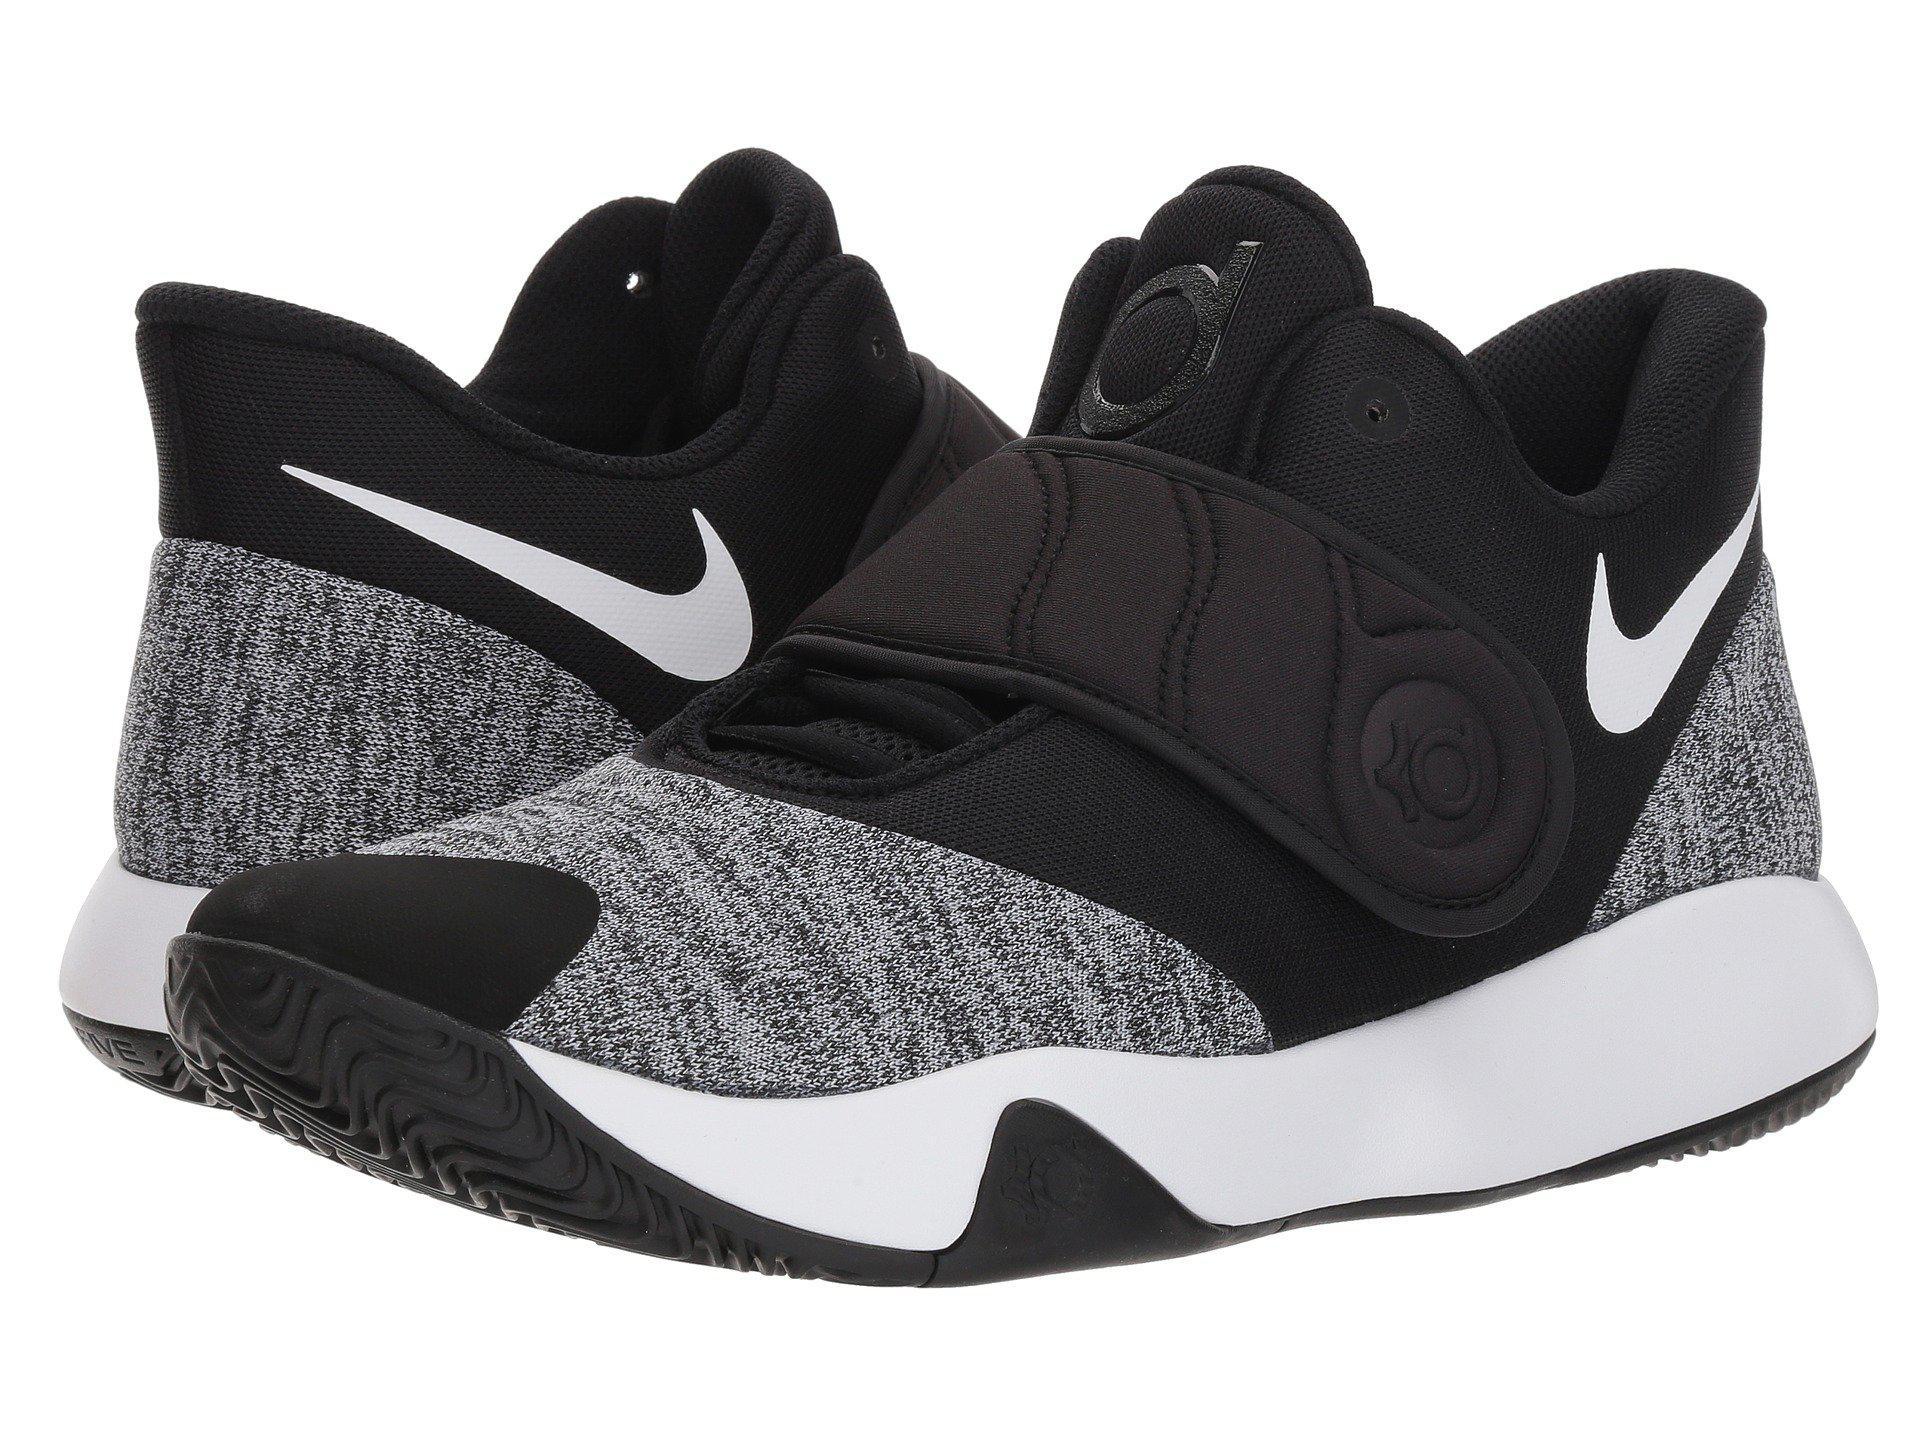 promo code c81a7 0220a Nike. Men s Black Kd Trey 5 Vi